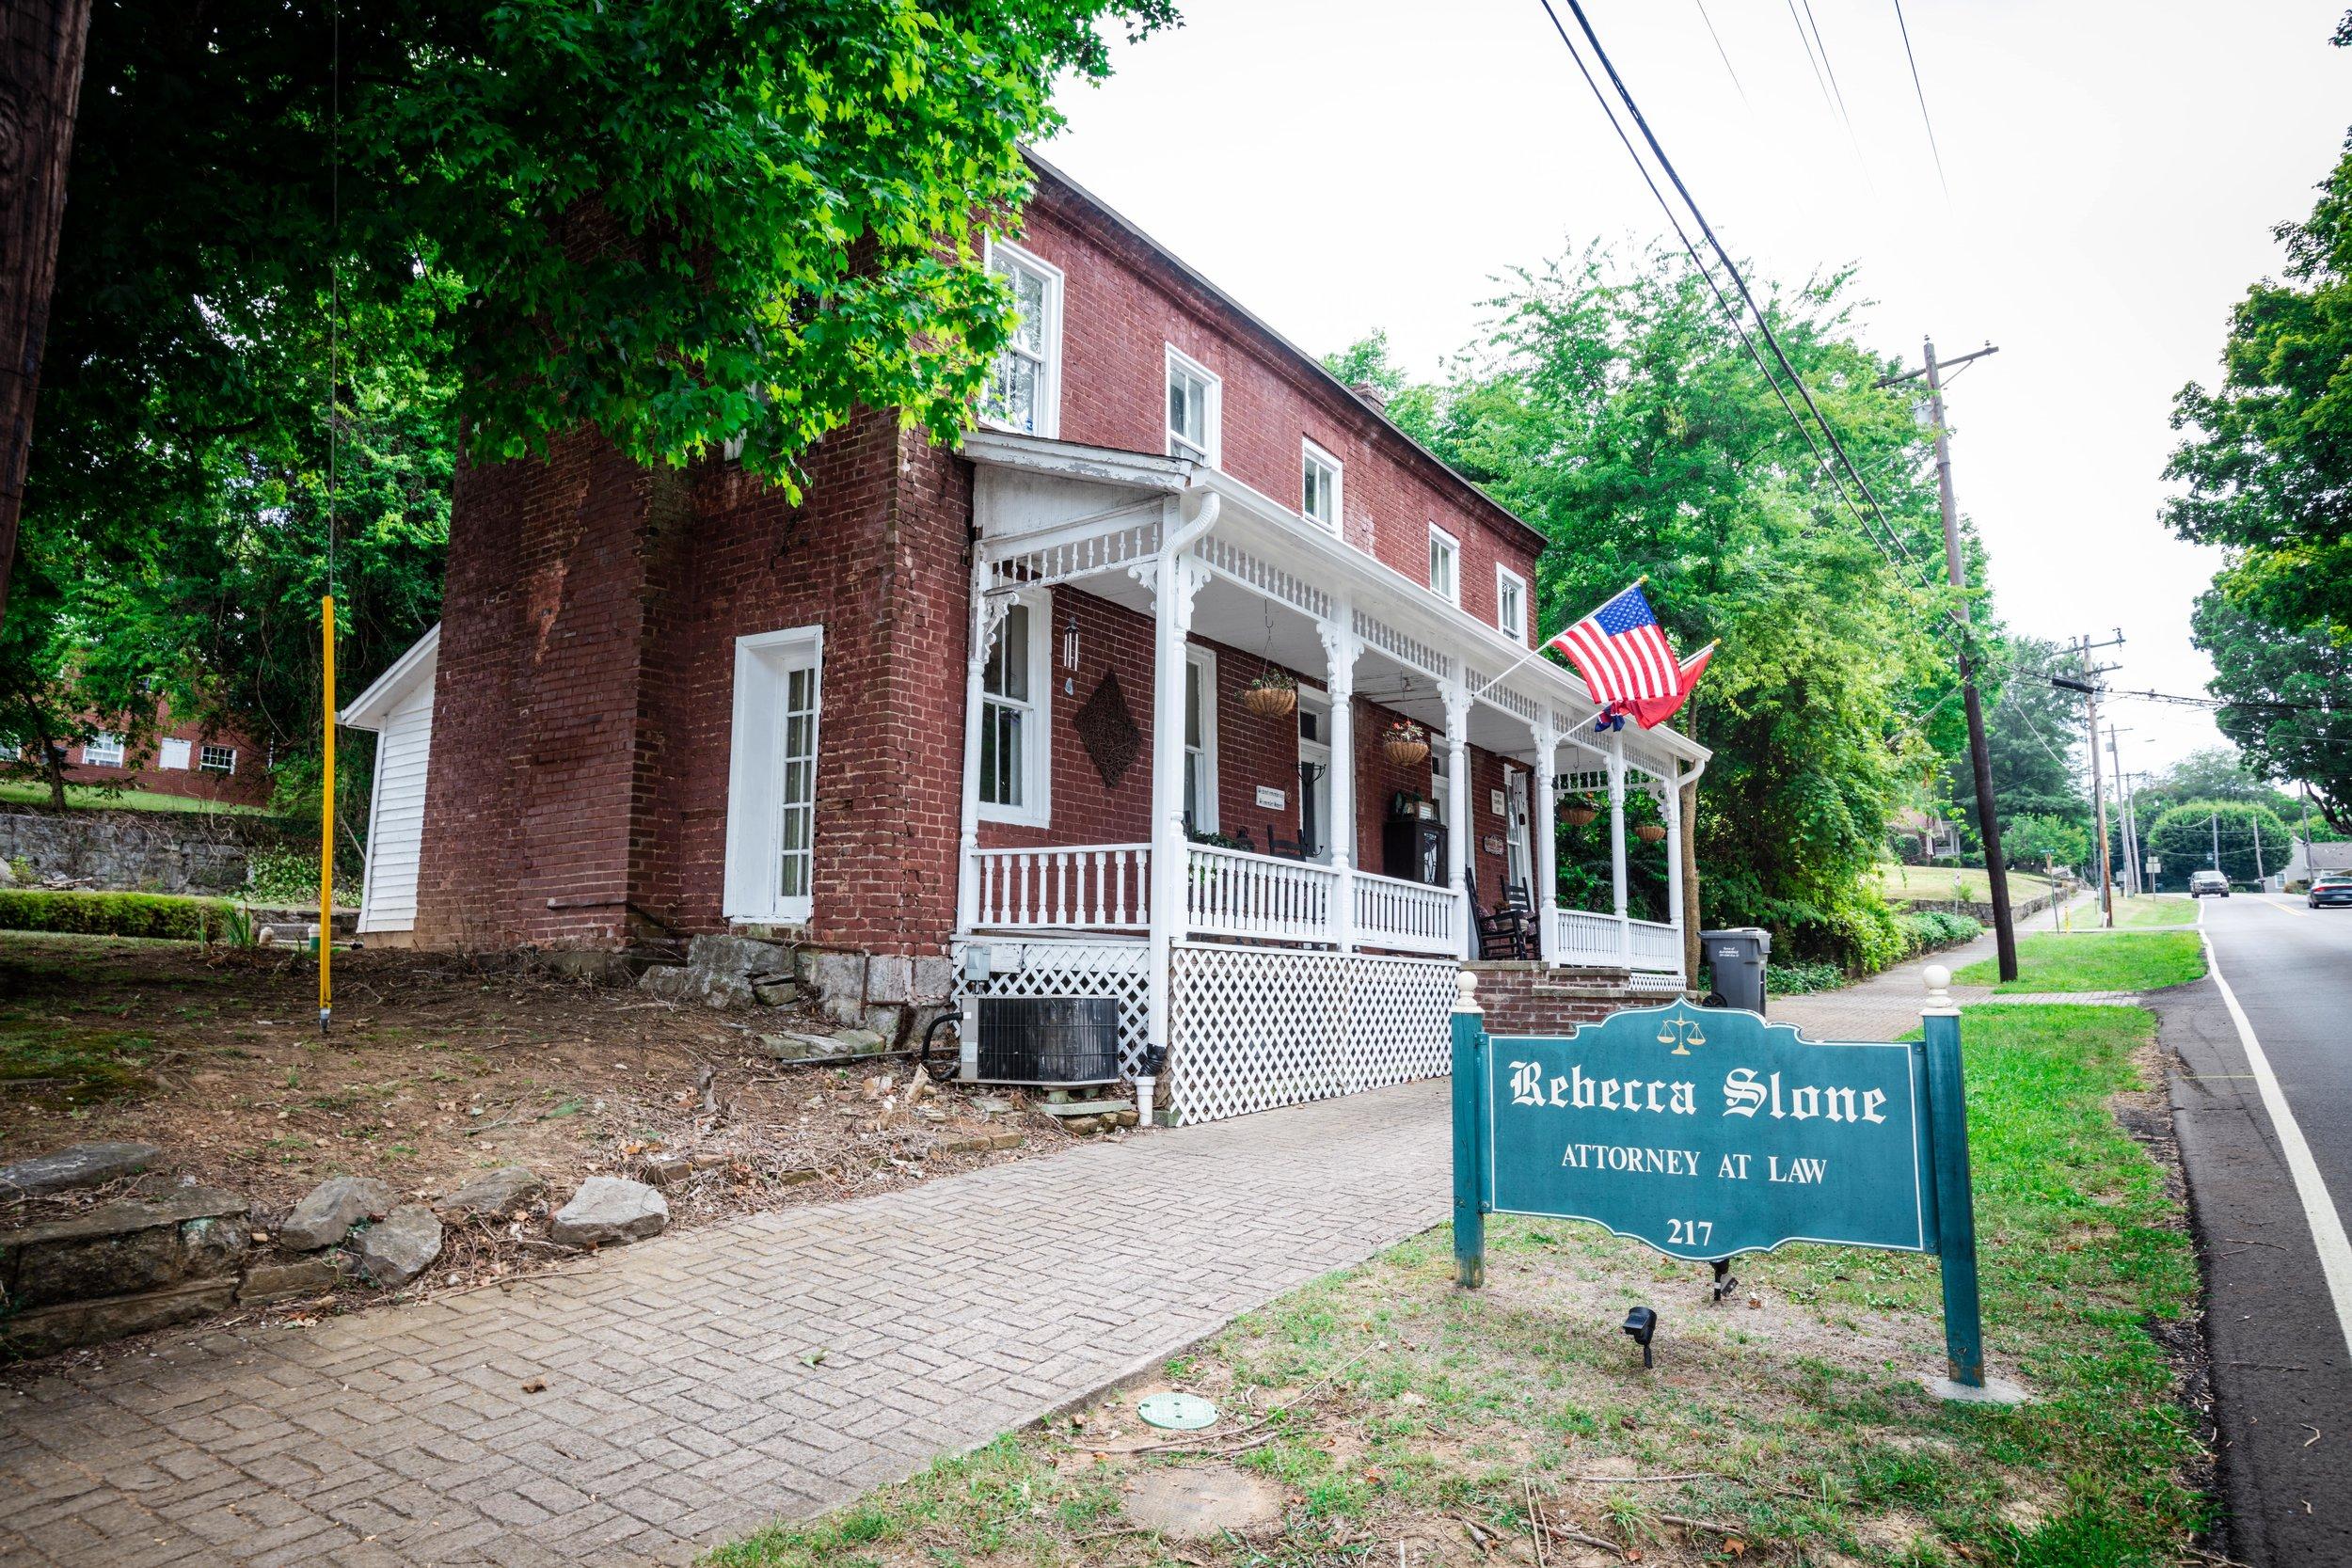 217 W. Main Street – Roper Tavern circa 1817